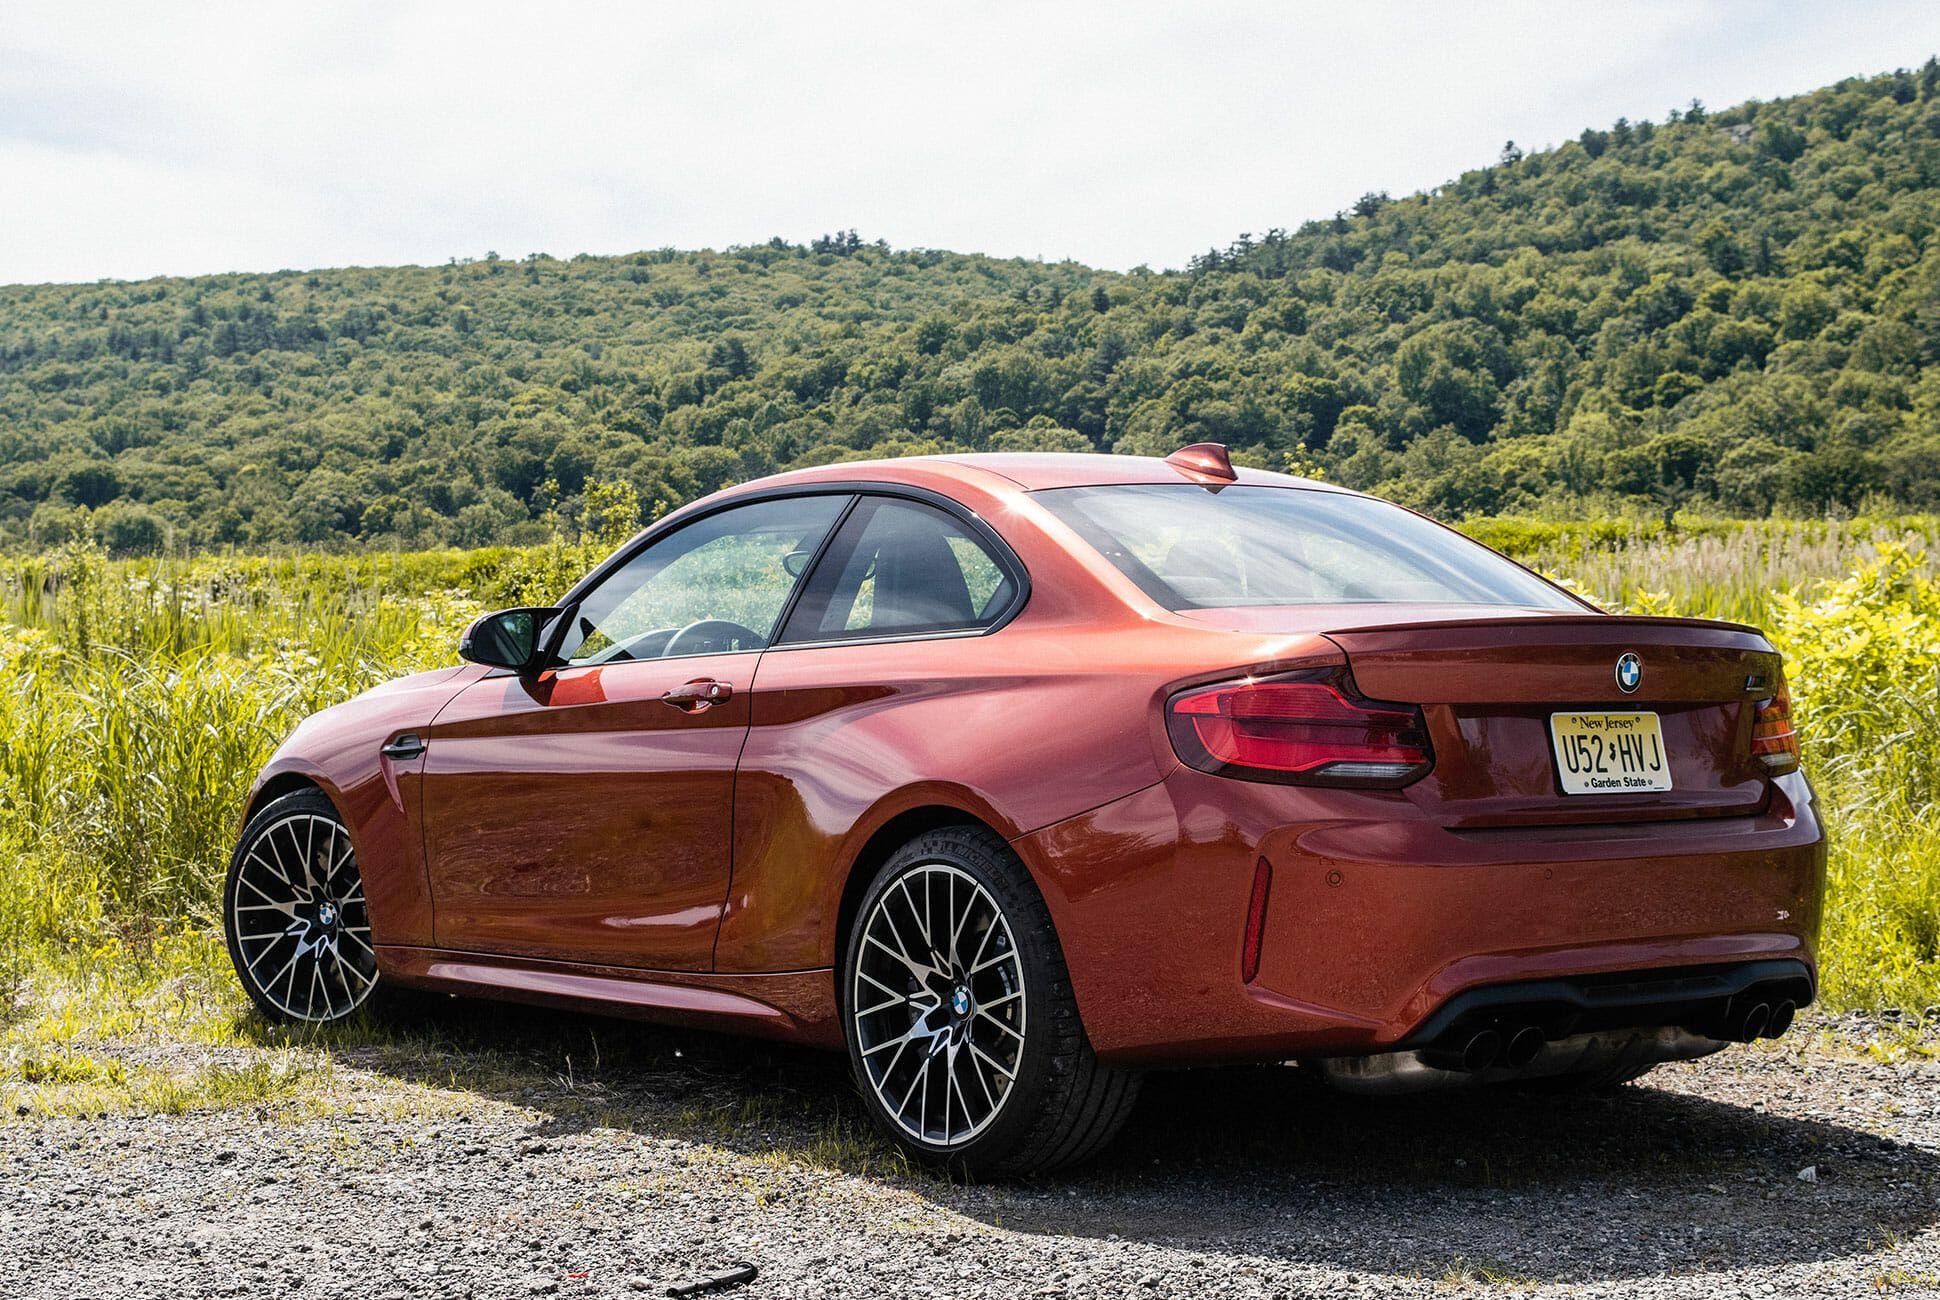 BMW-M2-Review-gear-patrol-slide-2-2